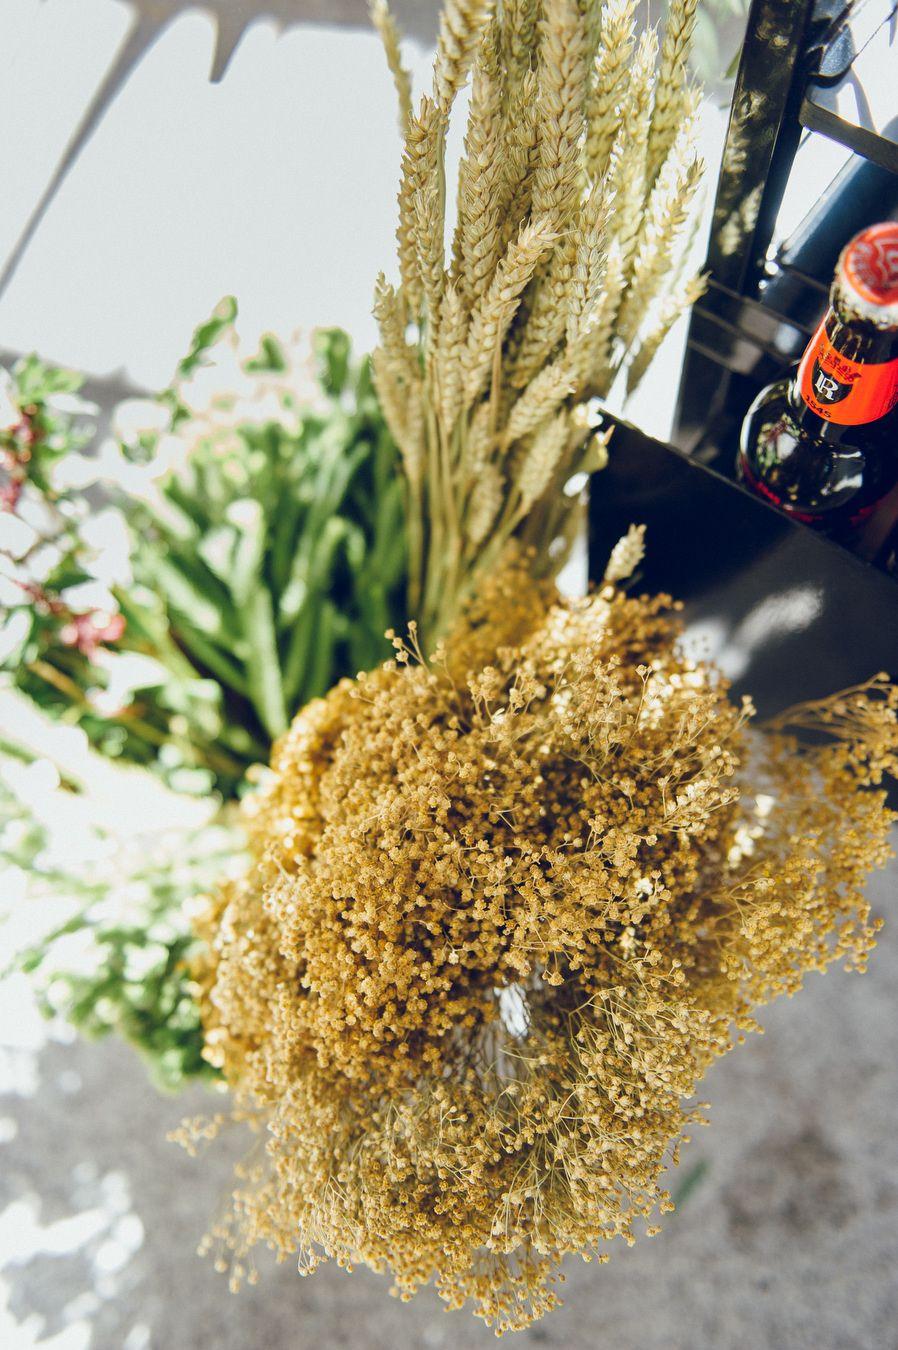 calista-one-lista-de-bodas-online-blog-de-bodas-calista-one-summer-party-2016-roman-cervezas-7